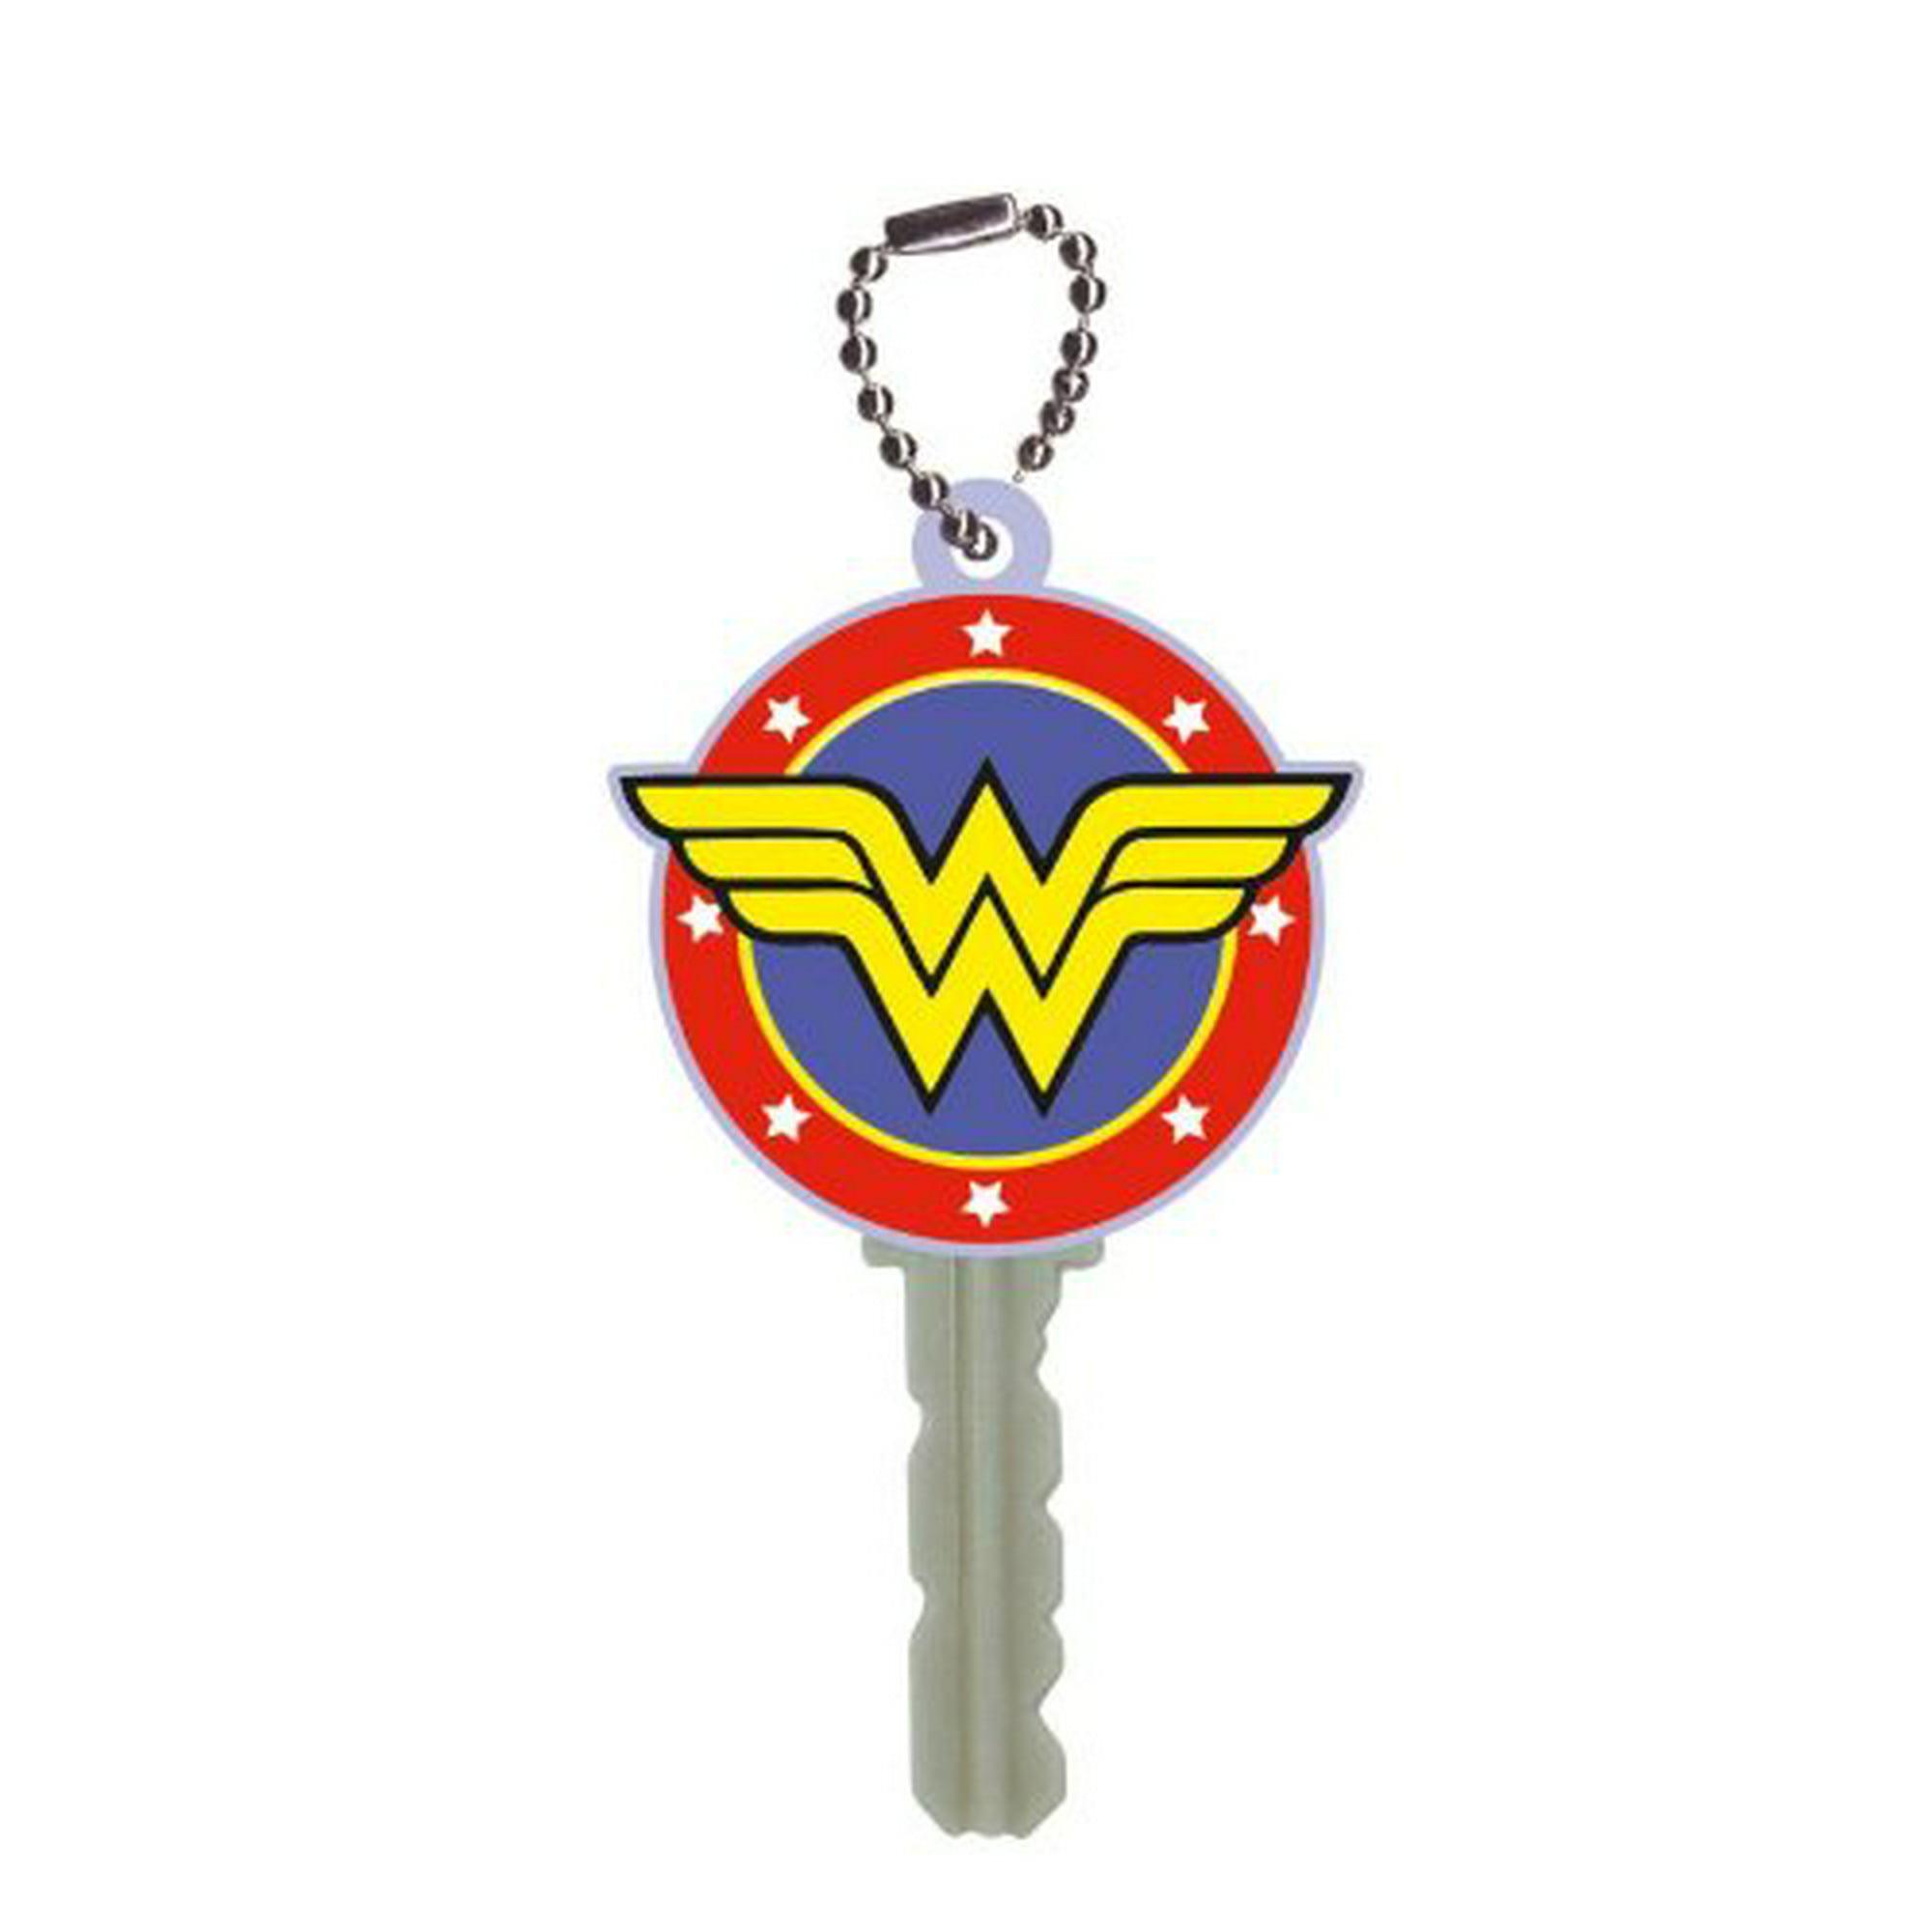 Dc Comics Soft Touch Key Cover Wonder Woman Logo Walmart Canada